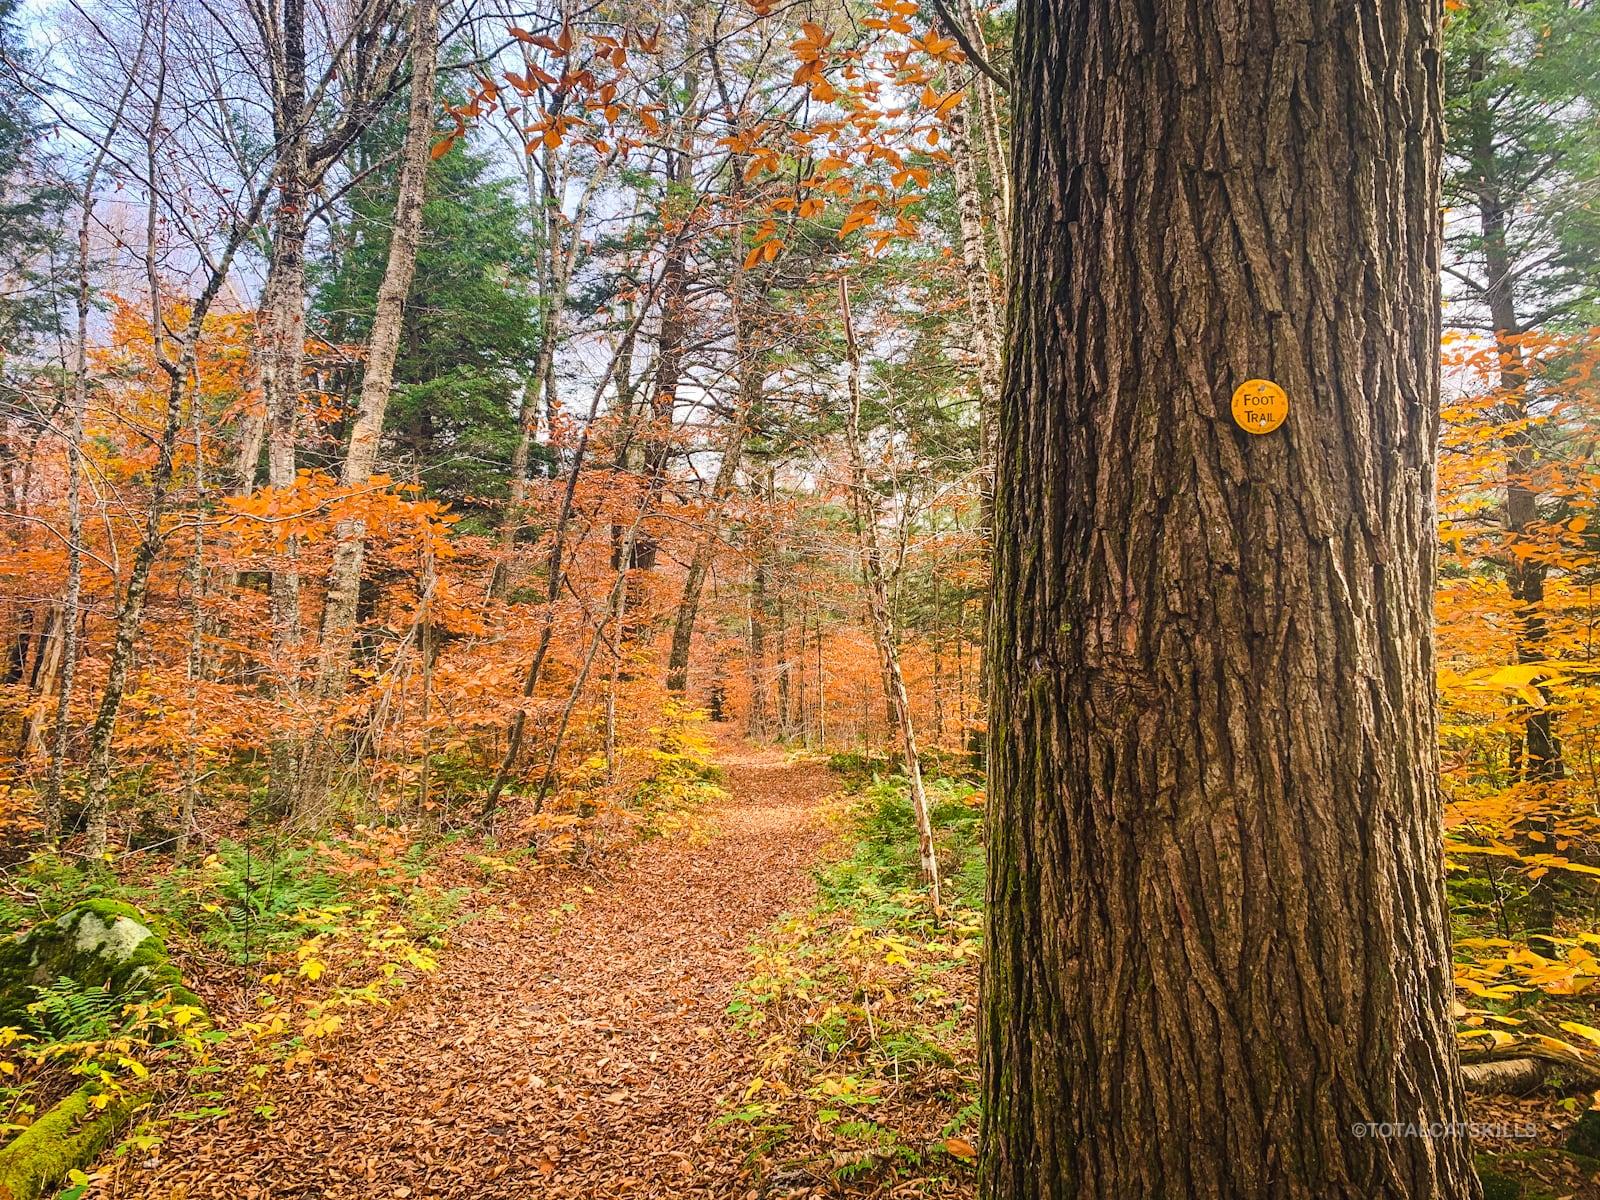 yellow trail blaze on tree trunk